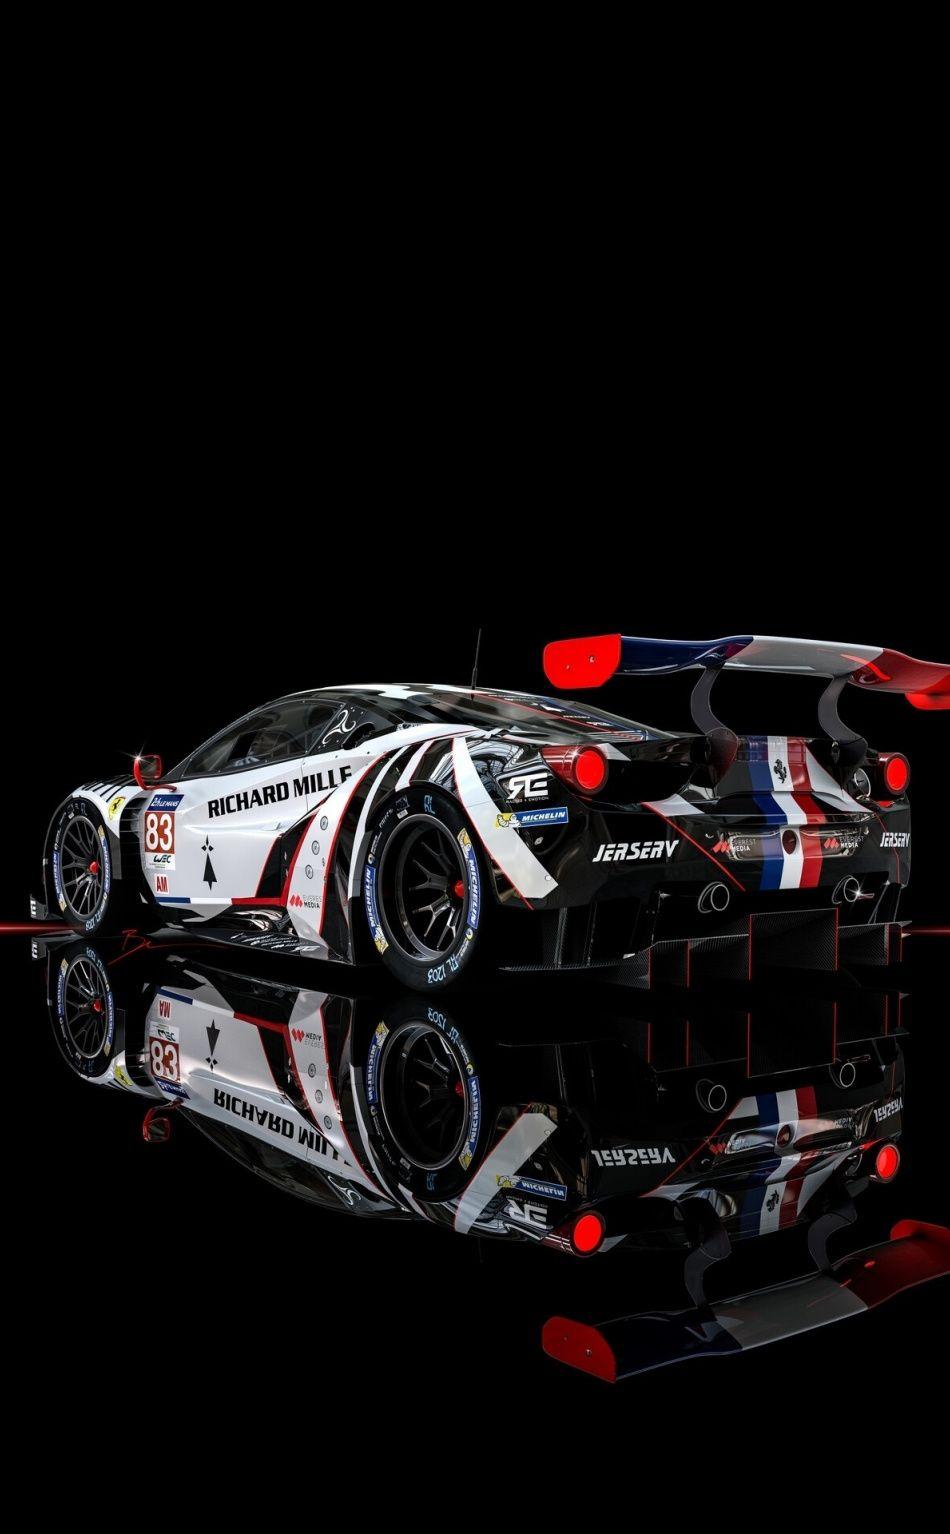 950x1534 Ferrari Race Car Rear Wallpaper Race Cars Sports Cars Luxury Racing